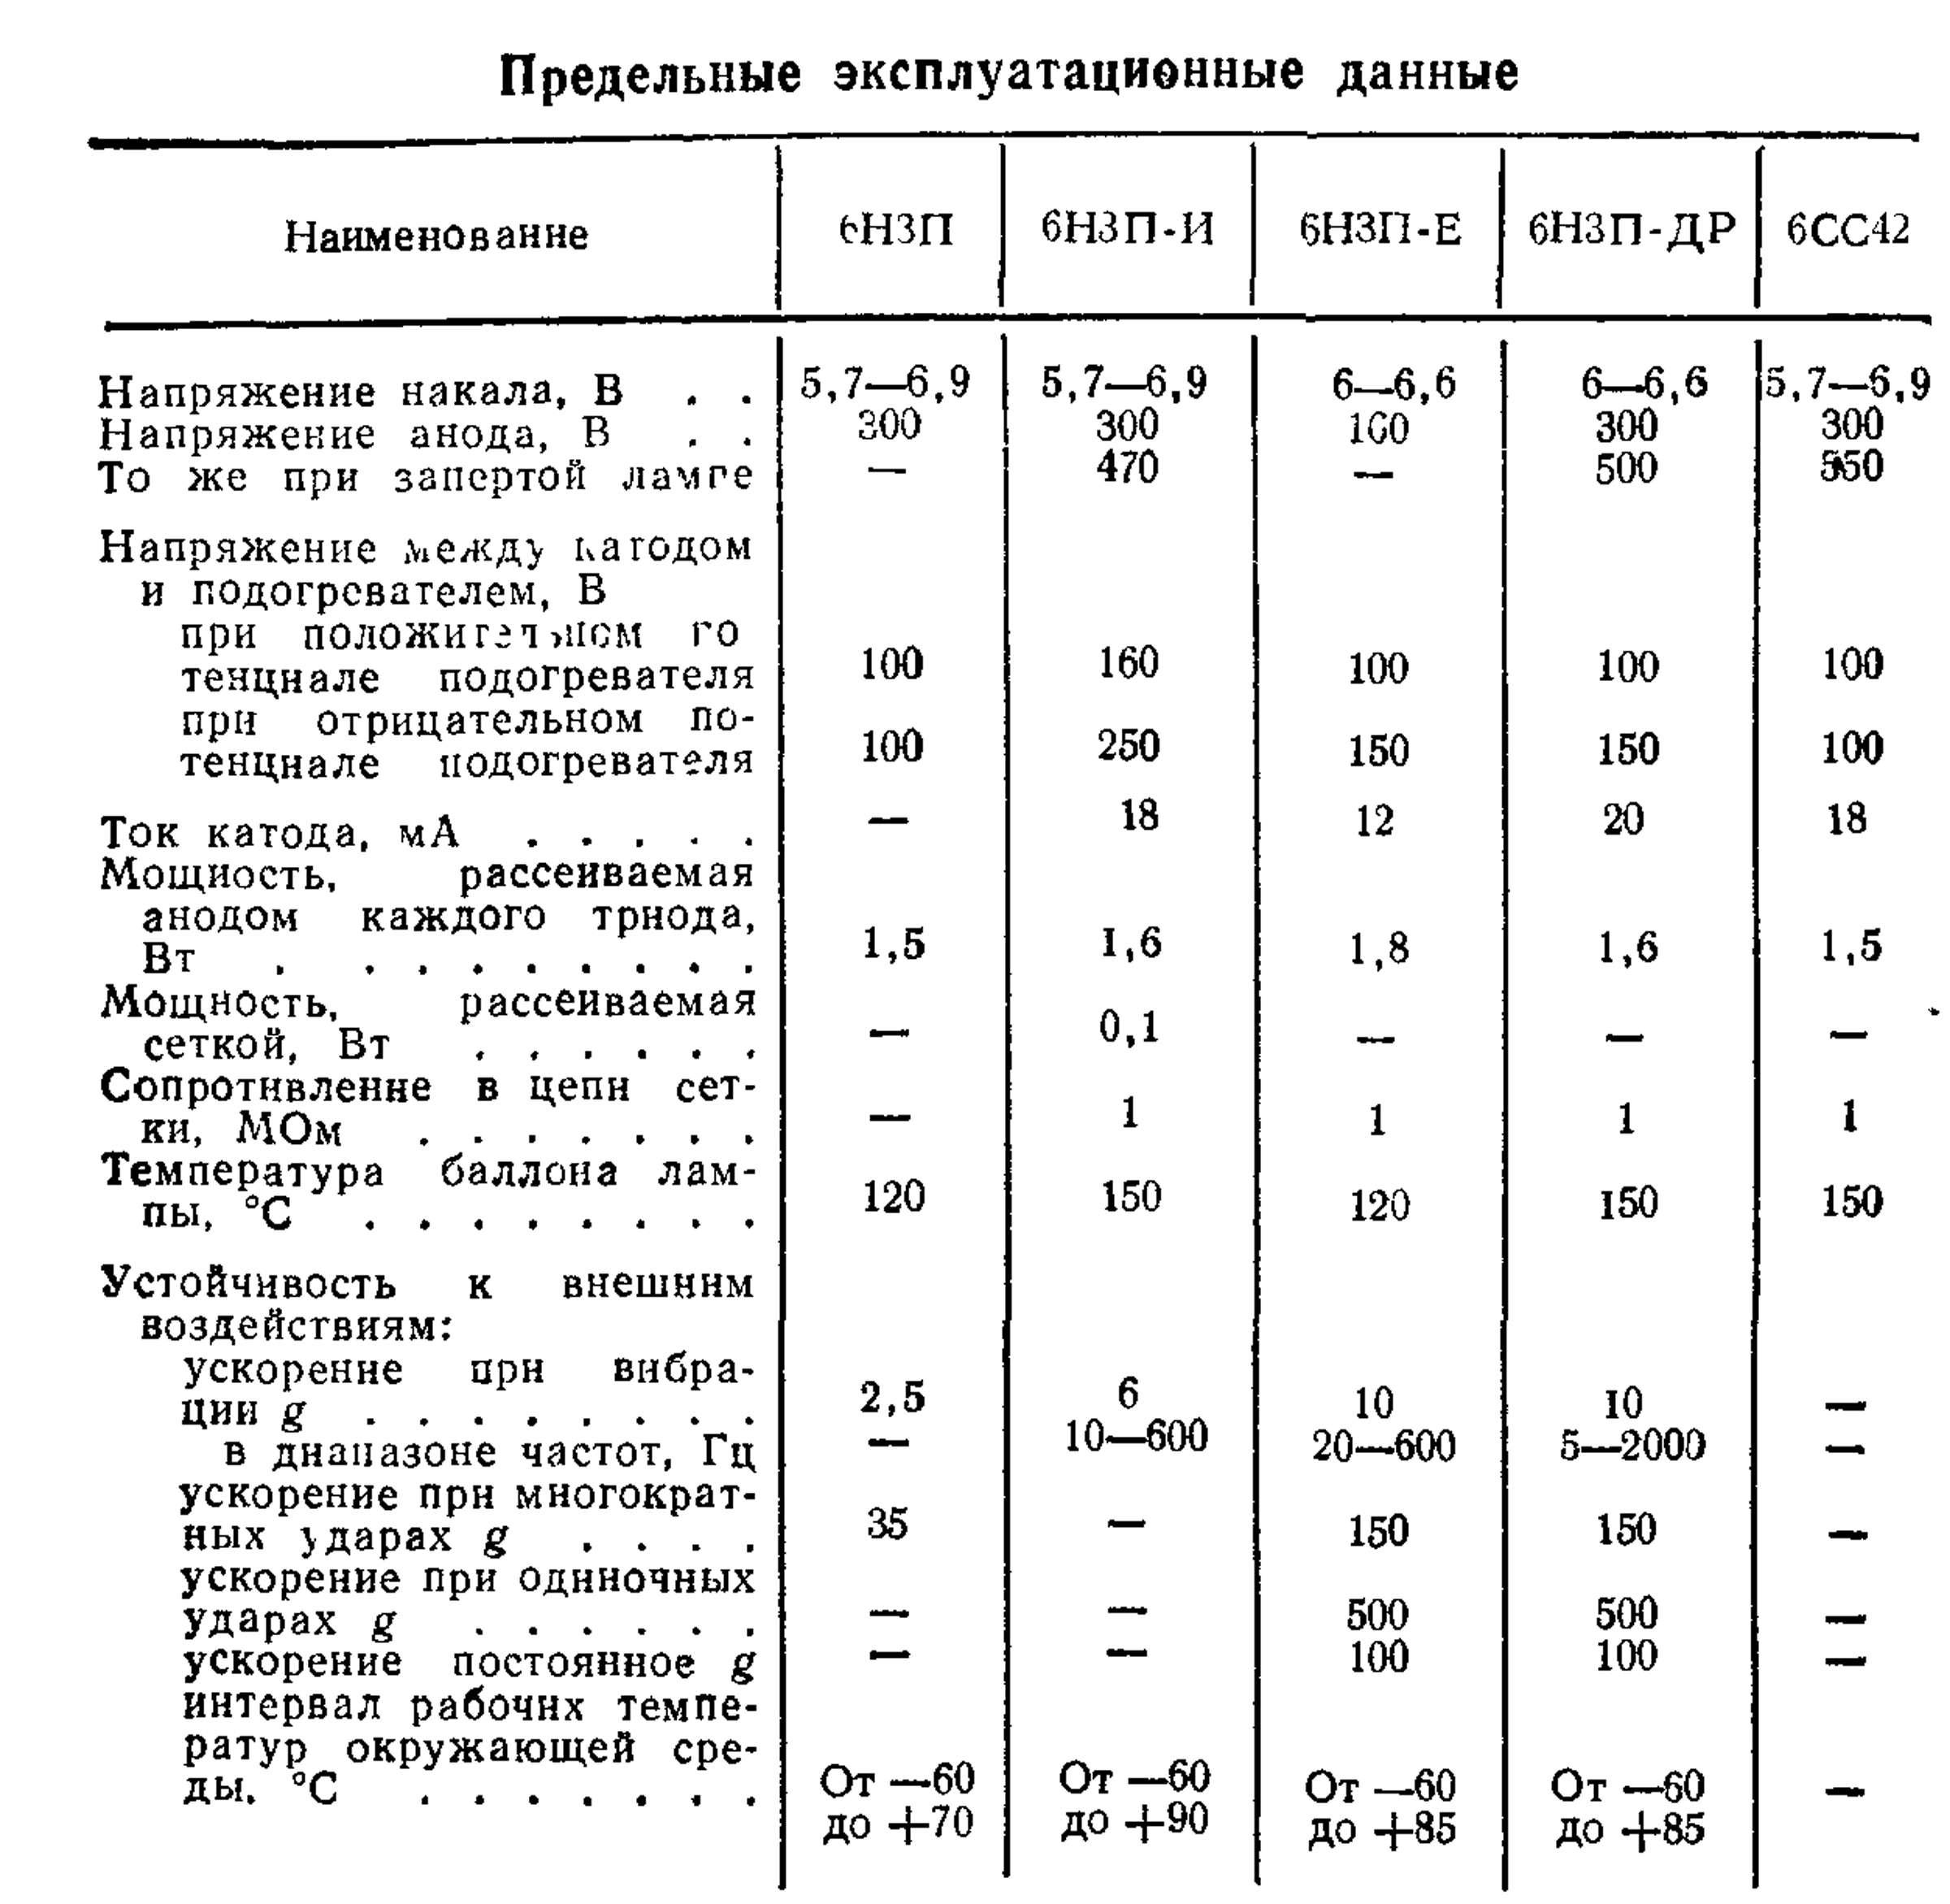 Параметры радиоламп 6Н3П (И, Е, ДР), 6СС42